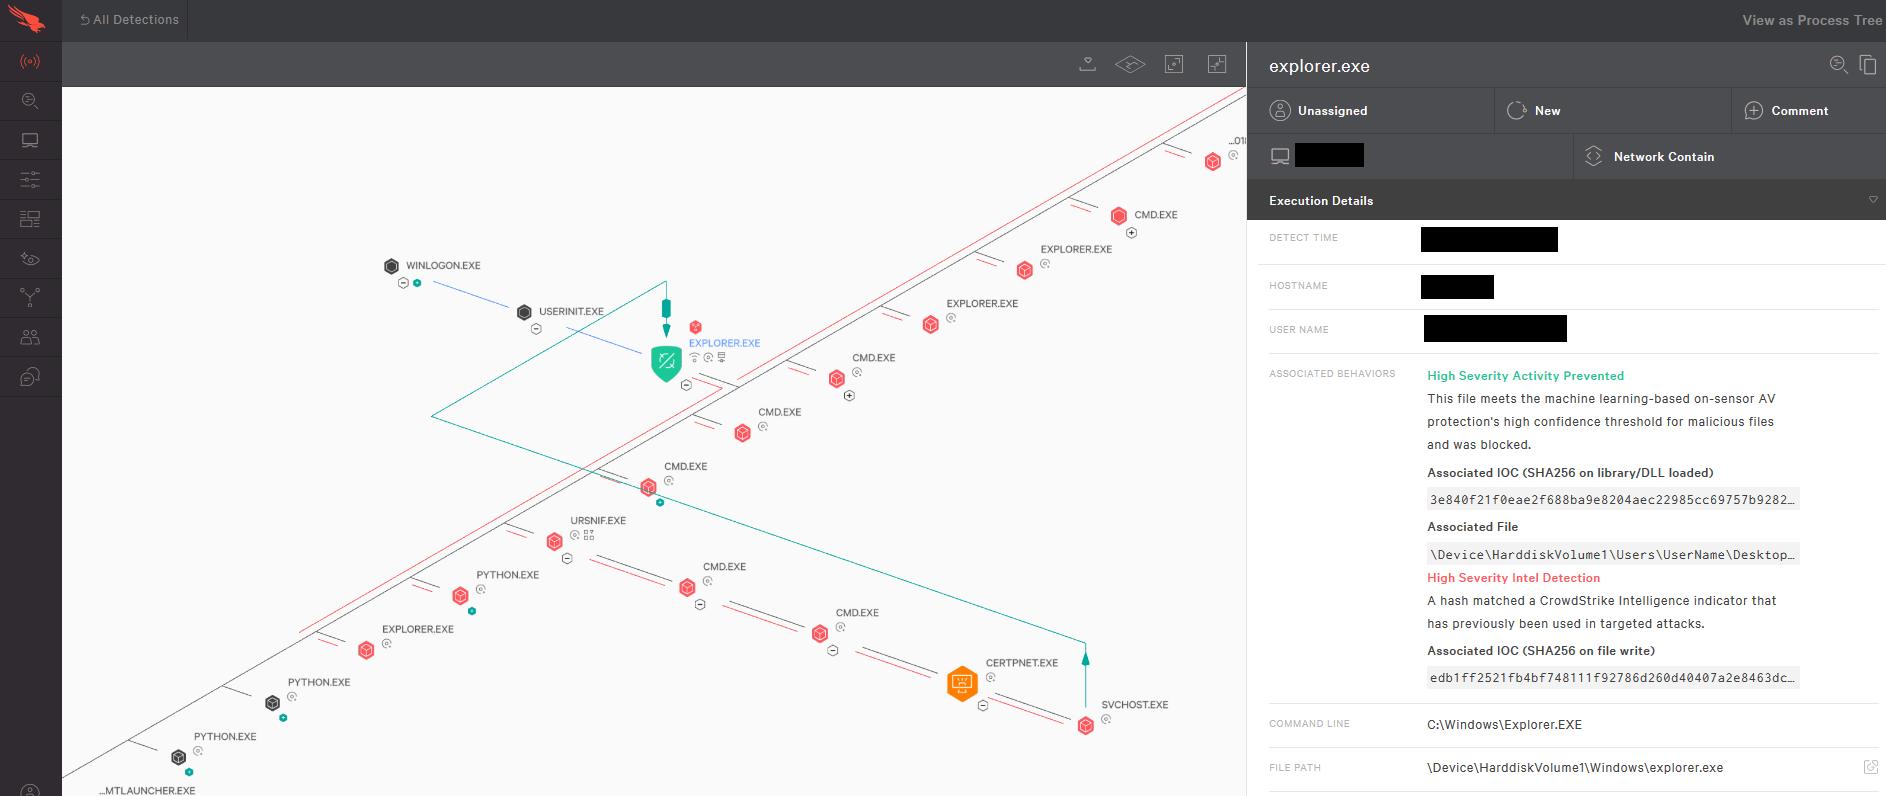 crowdstrike-dashboard-detection1